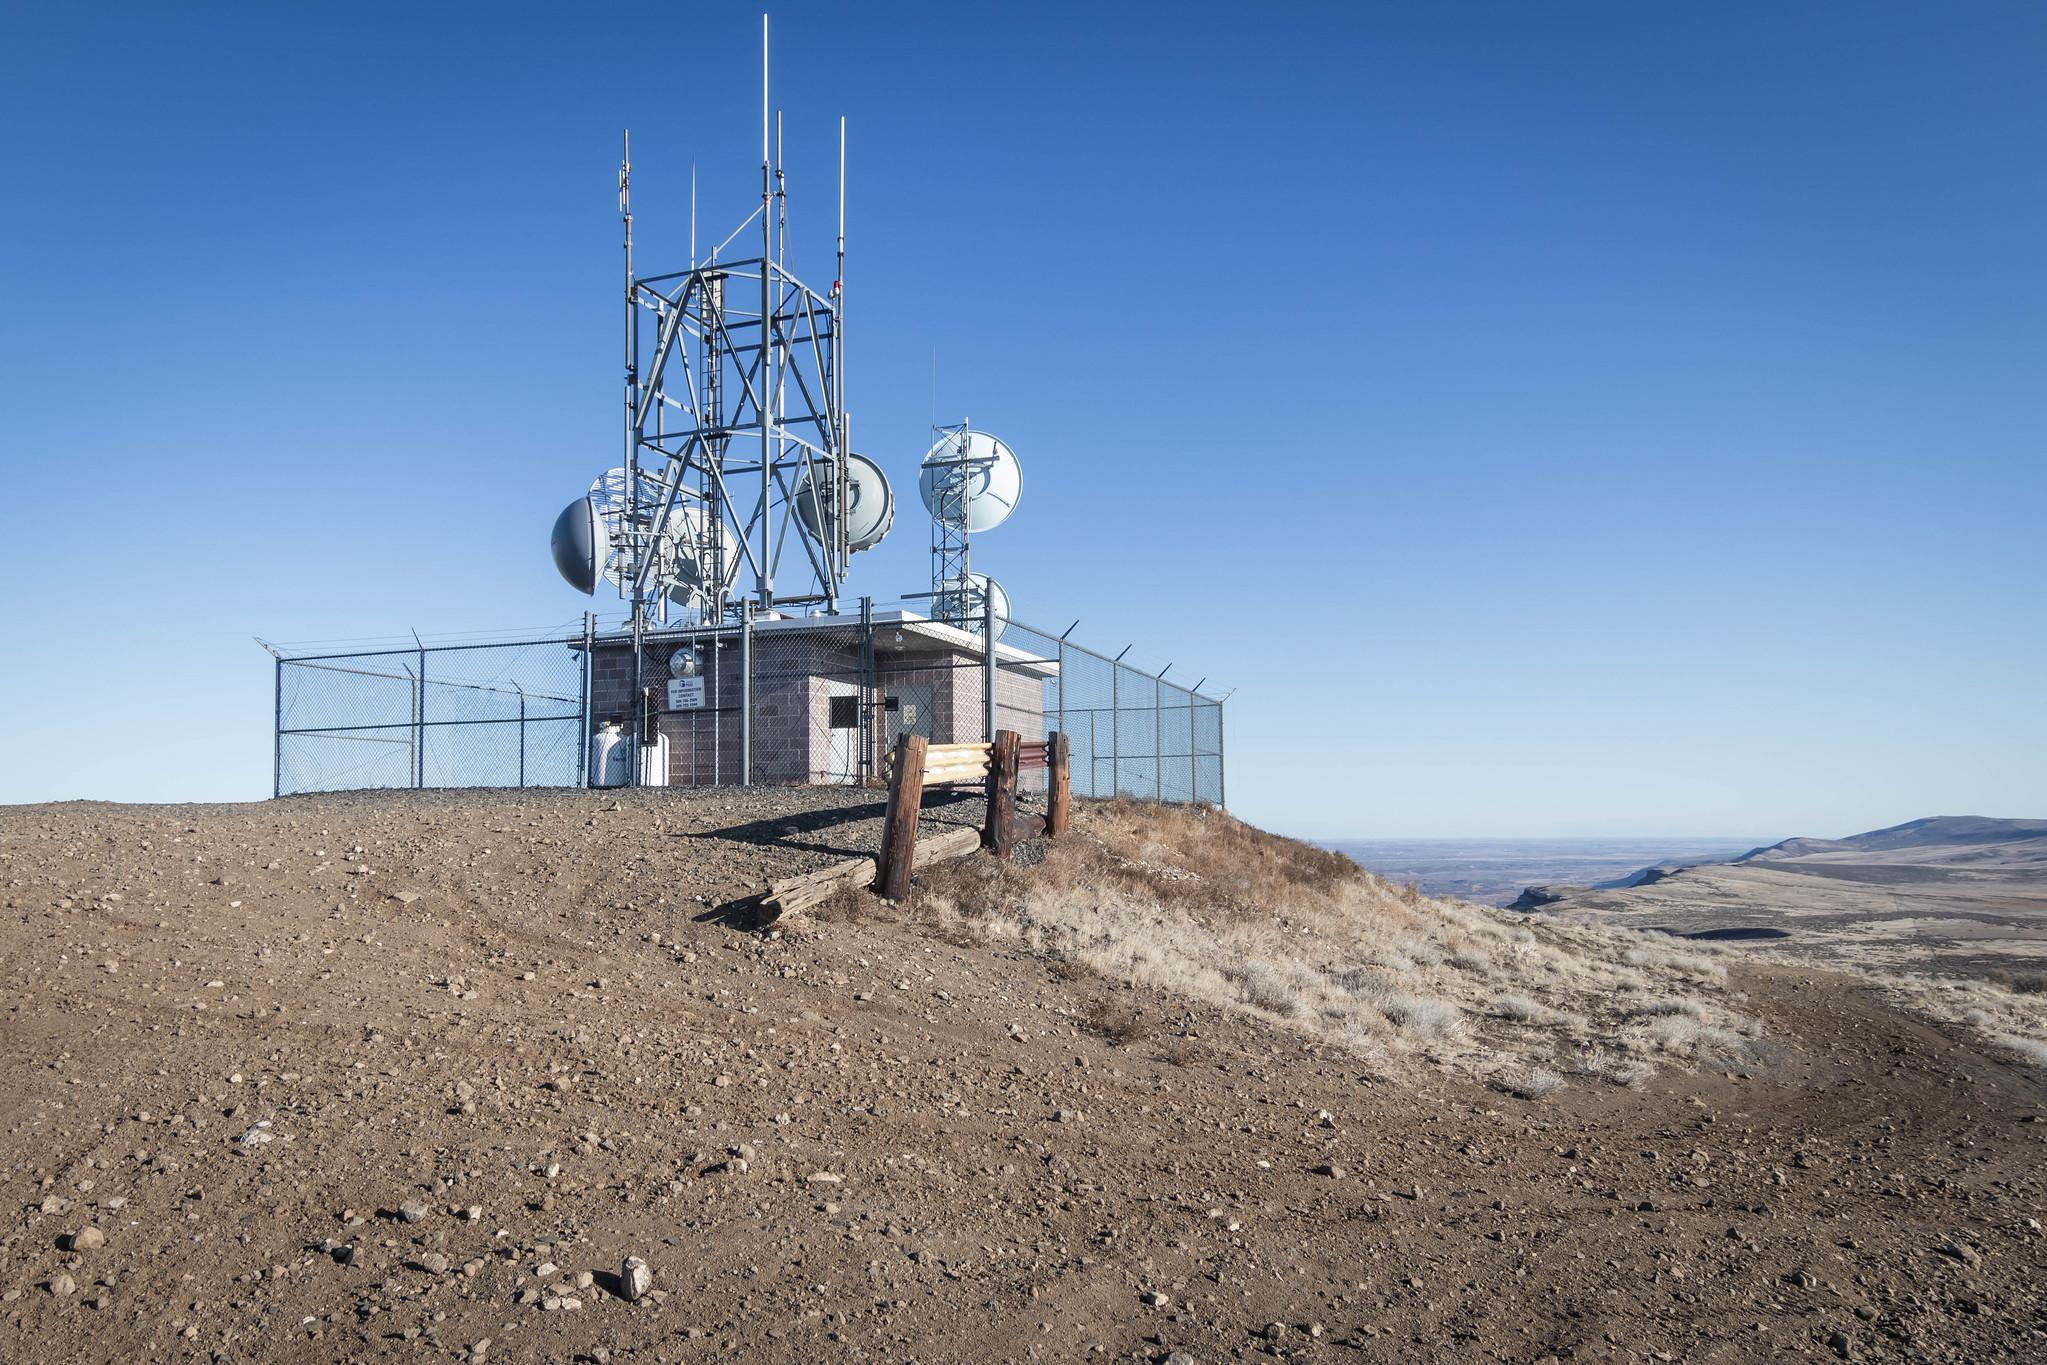 Sentinel Mountain radio towers